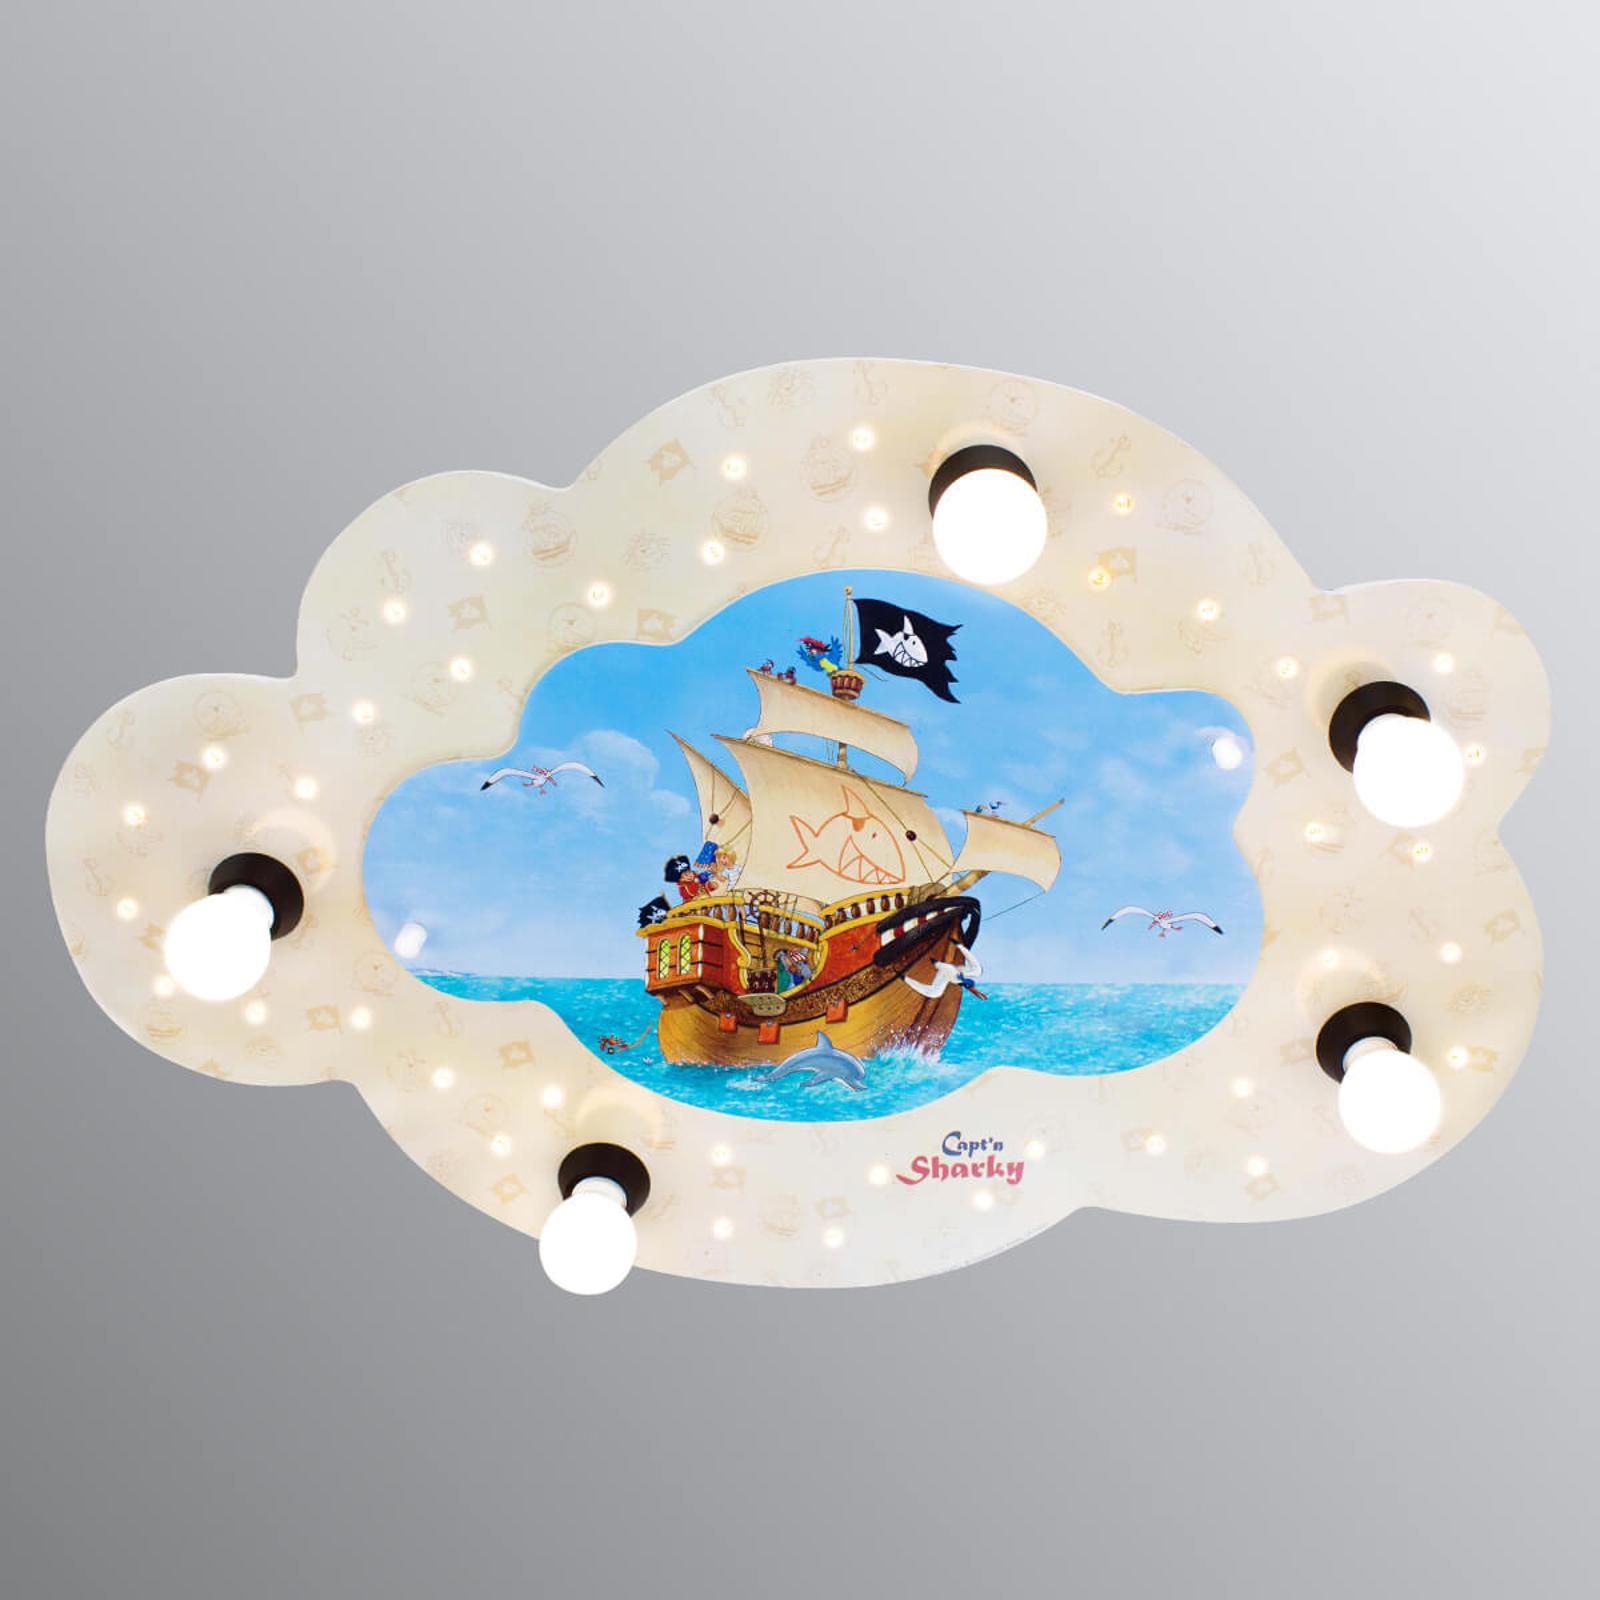 Jak chmura, lampa sufitowa Capt'n Sharky z LED